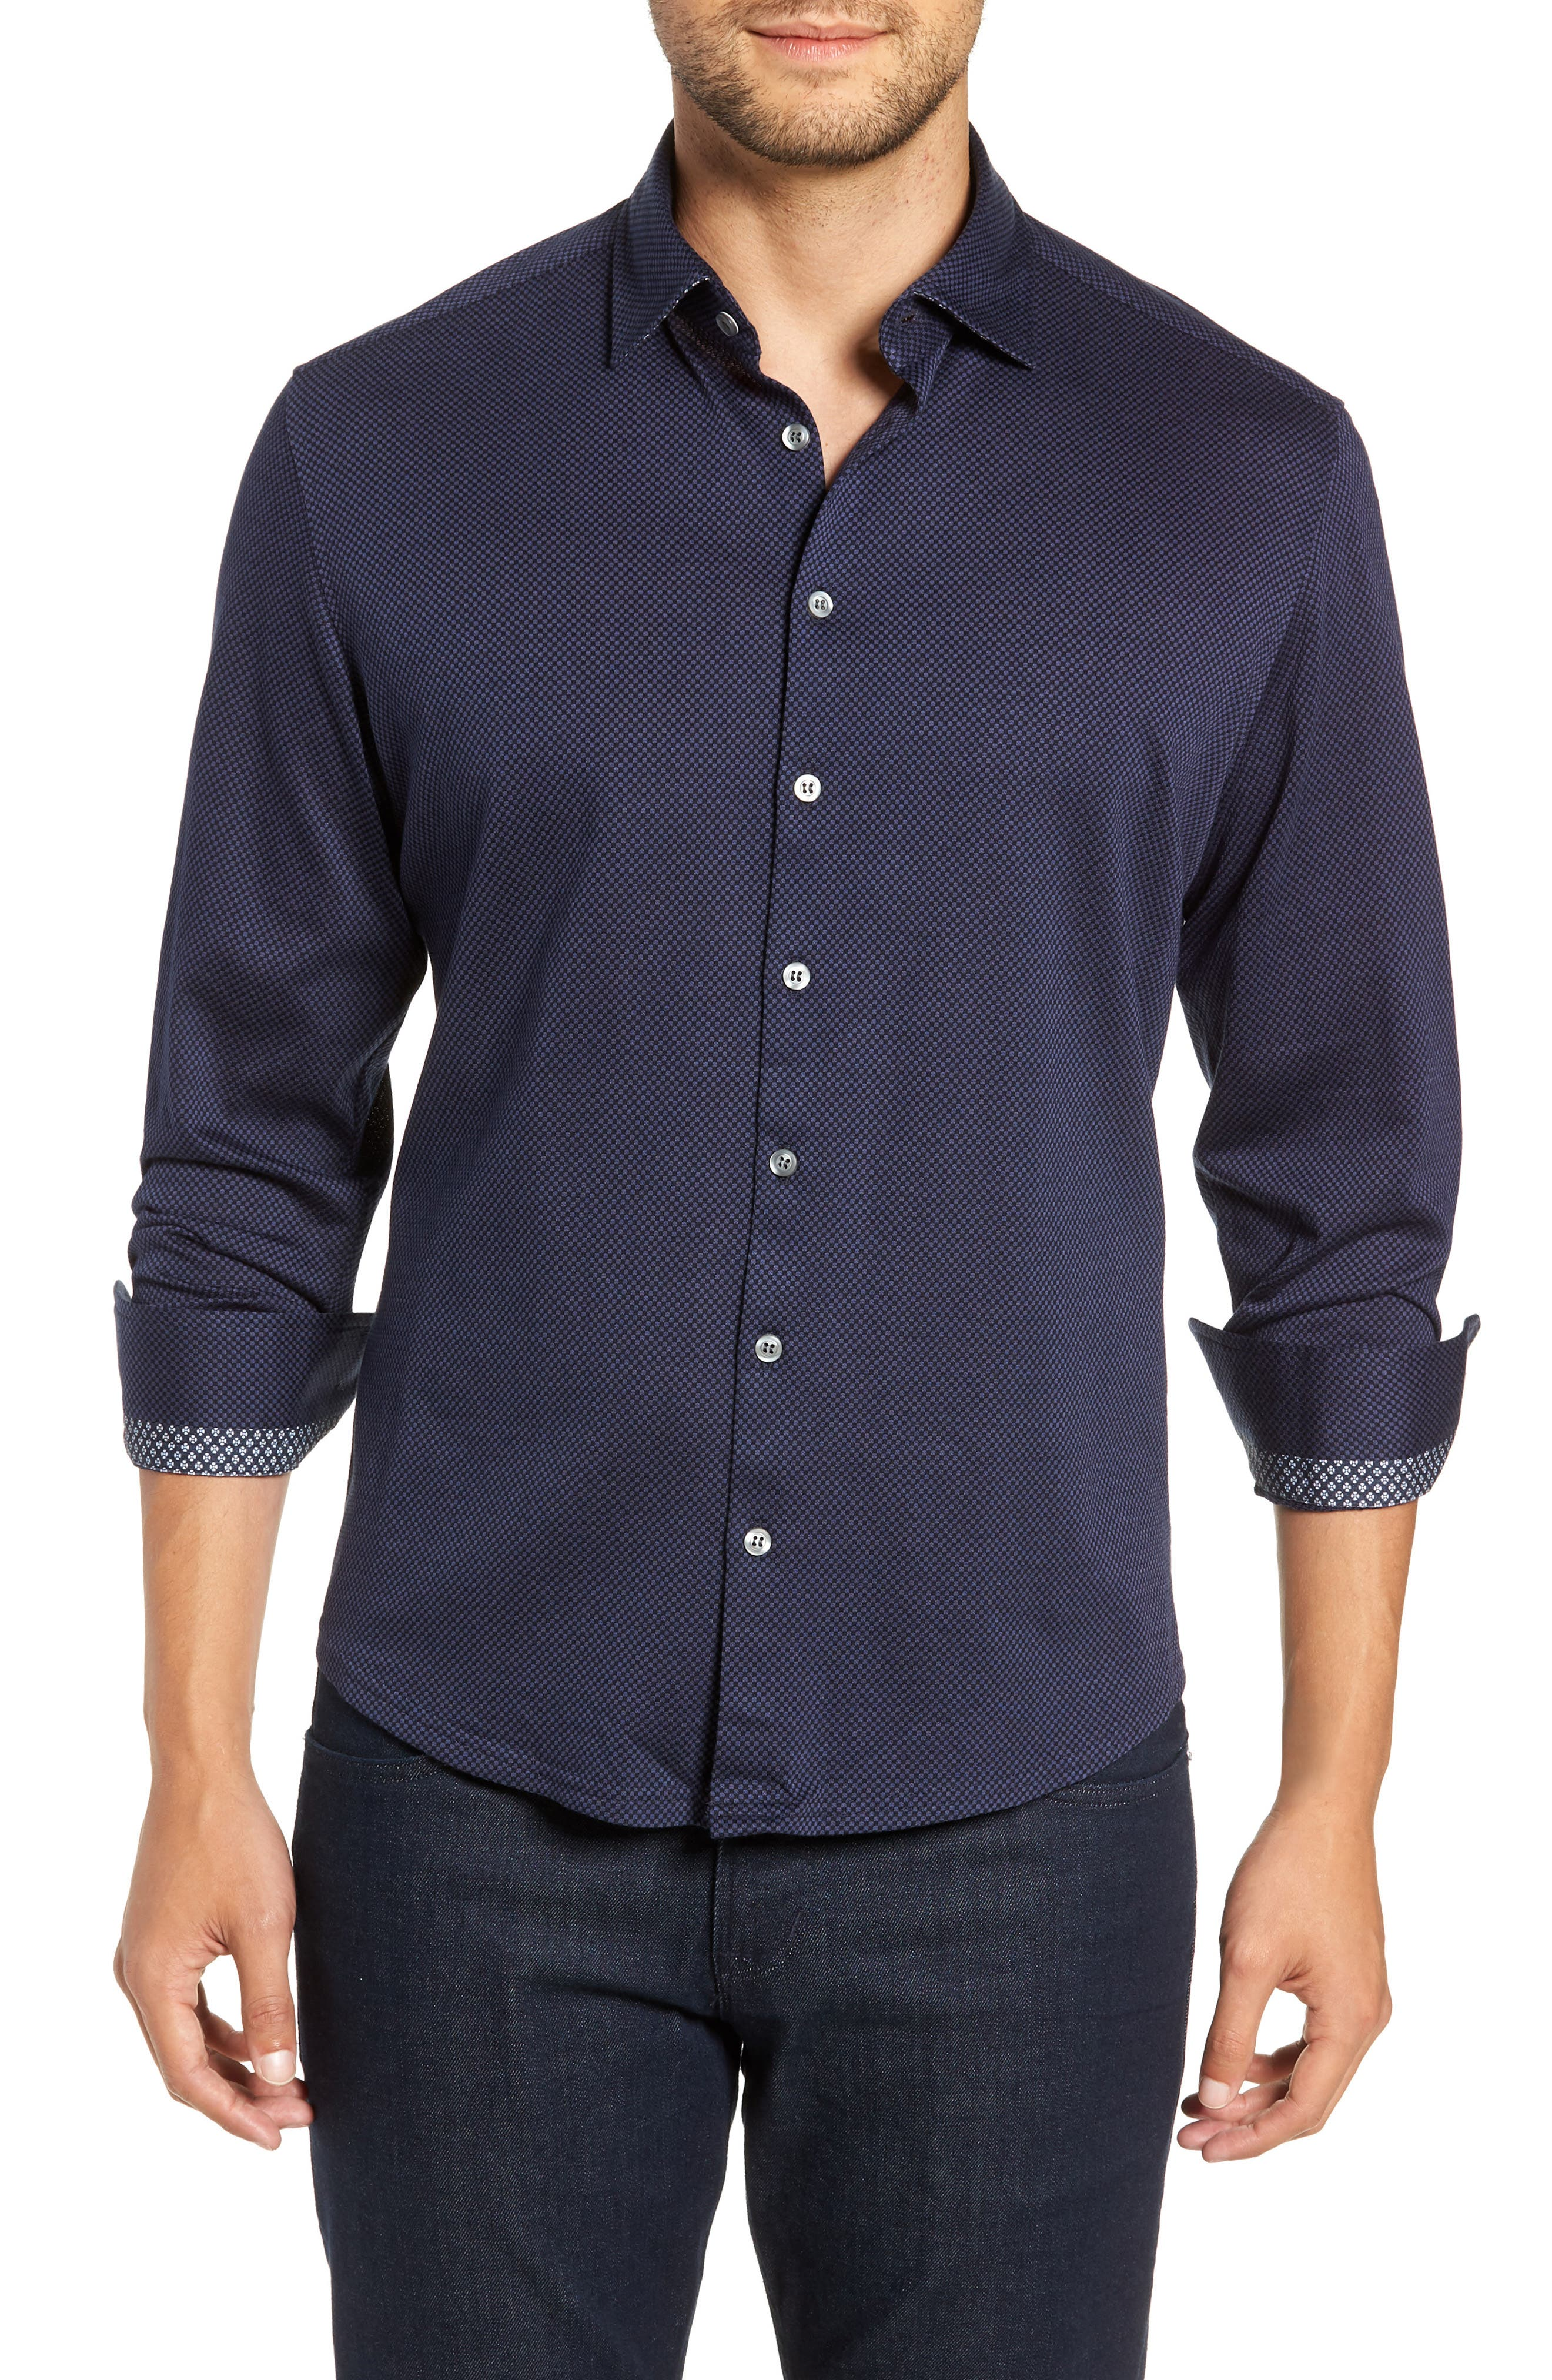 STONE ROSE,                             Trim Fit Knit Sport Shirt,                             Main thumbnail 1, color,                             410